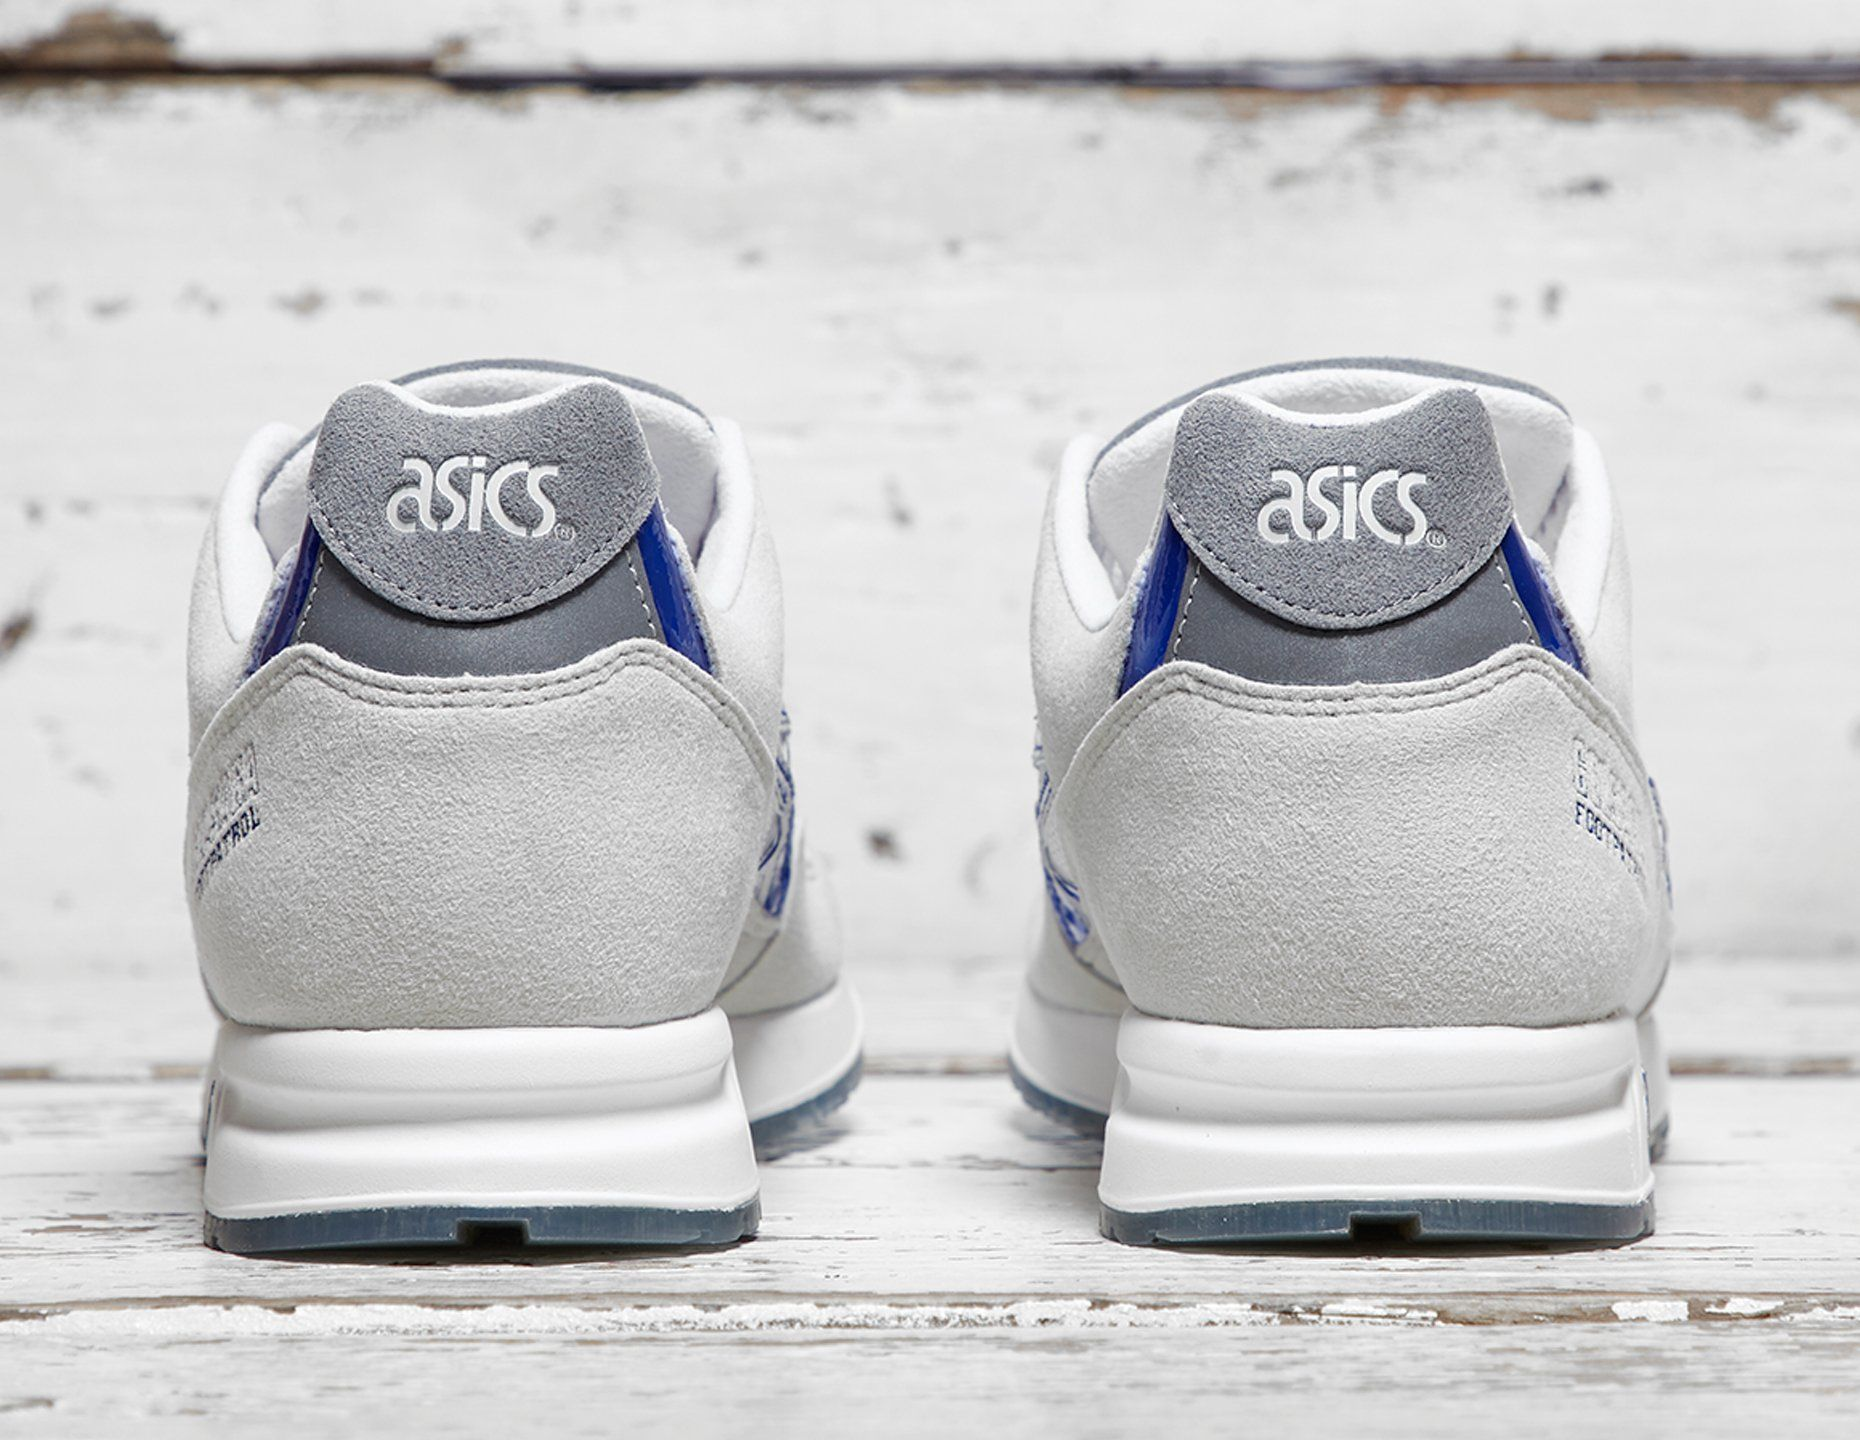 ASICS x Footpatrol GEL-SAGA